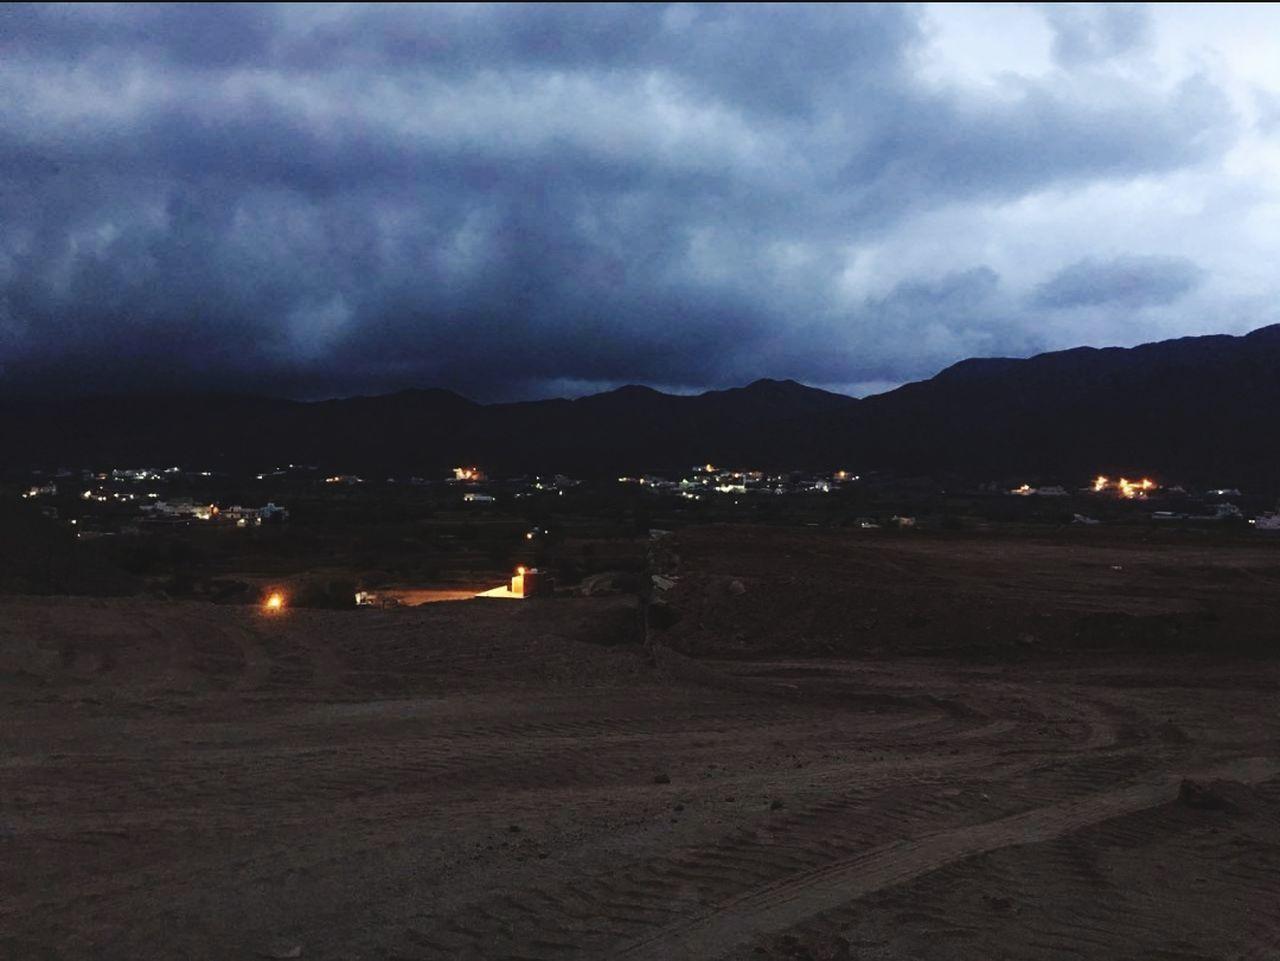 night, illuminated, sky, cloud - sky, no people, outdoors, mountain, nature, landscape, scenics, beauty in nature